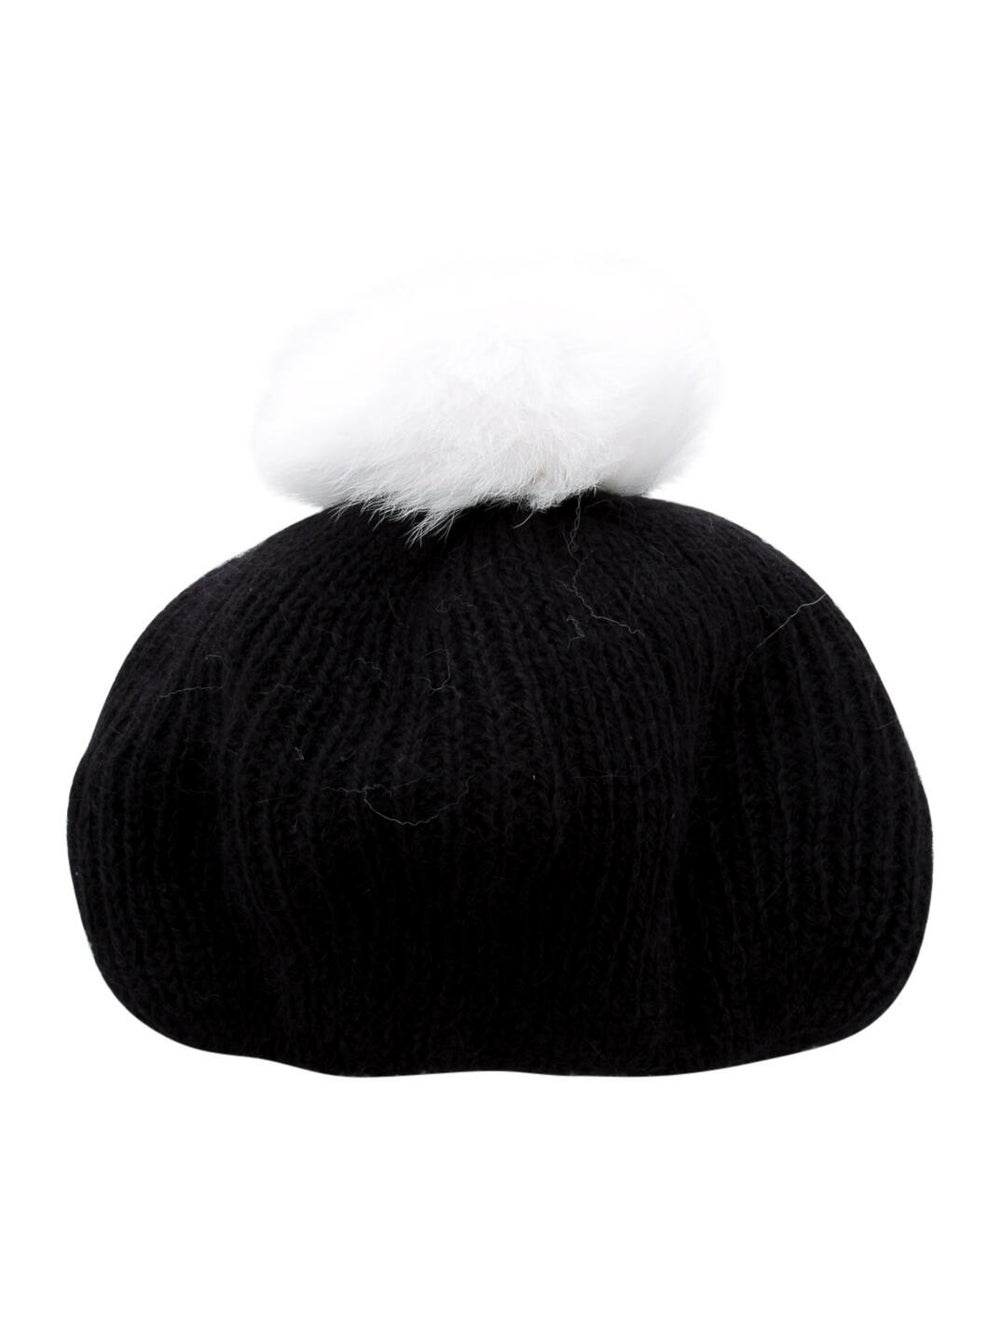 Eugenia Kim Wool Beret Hat Black - image 2